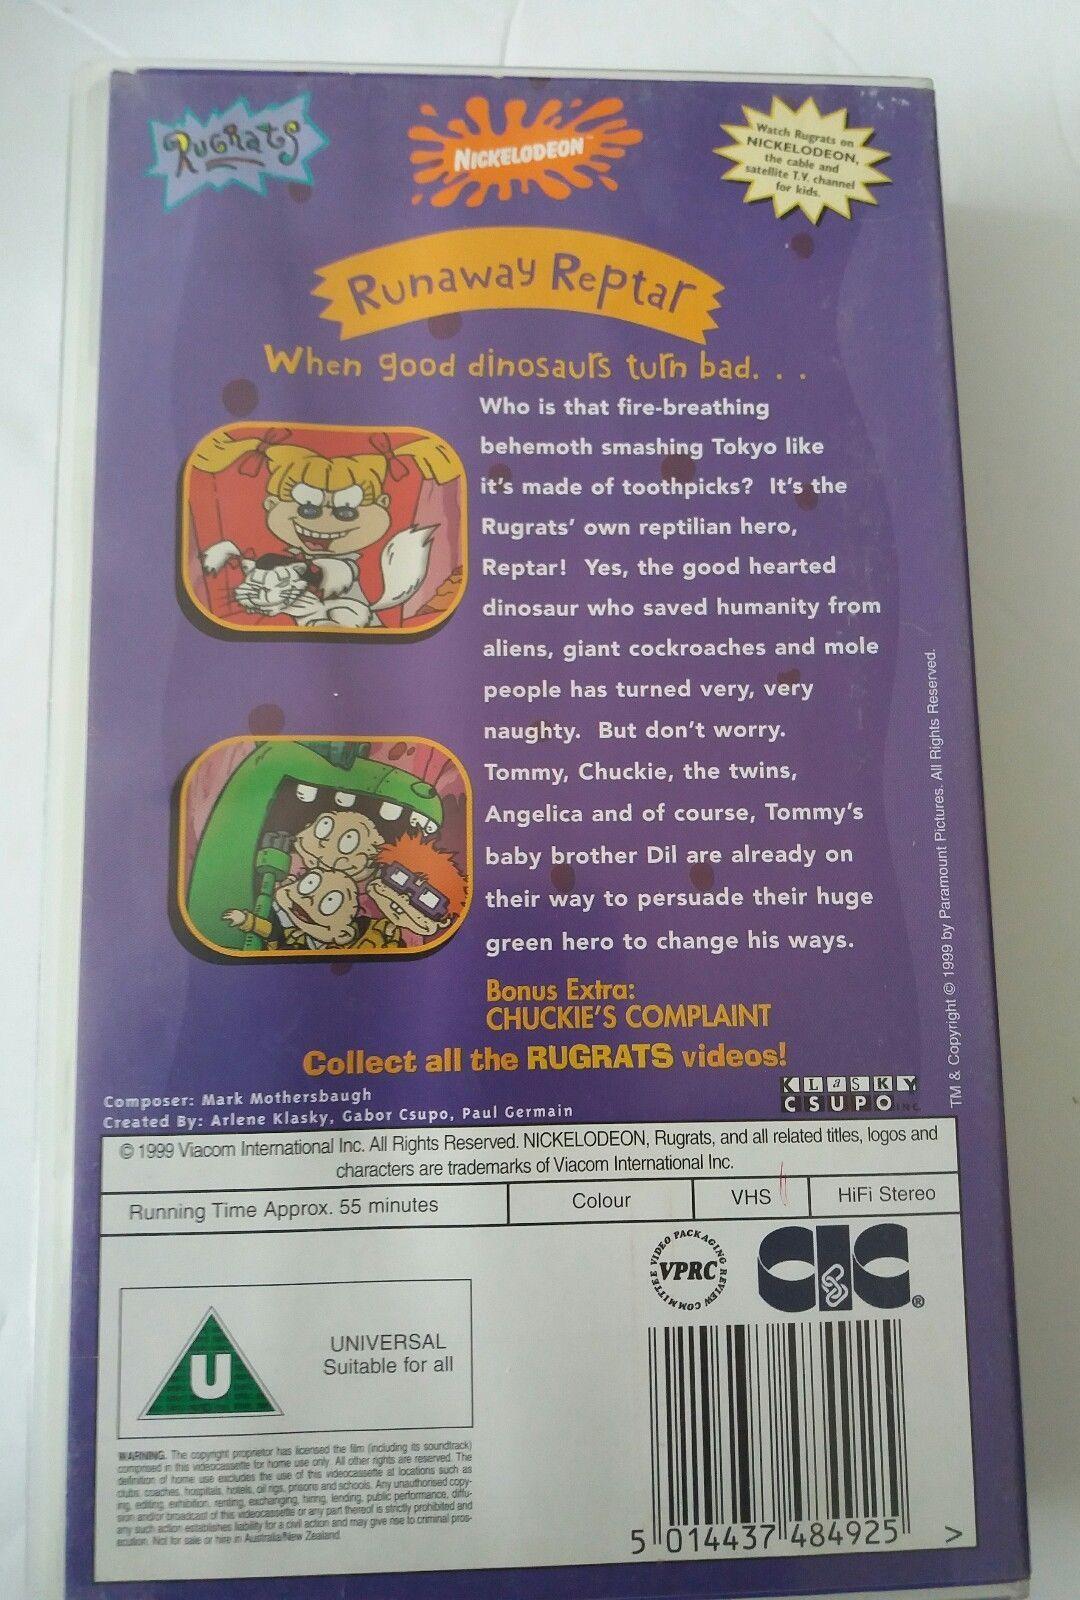 THE RUGRATS RUNAWAY REPTAR VHS VIDEO | eBay